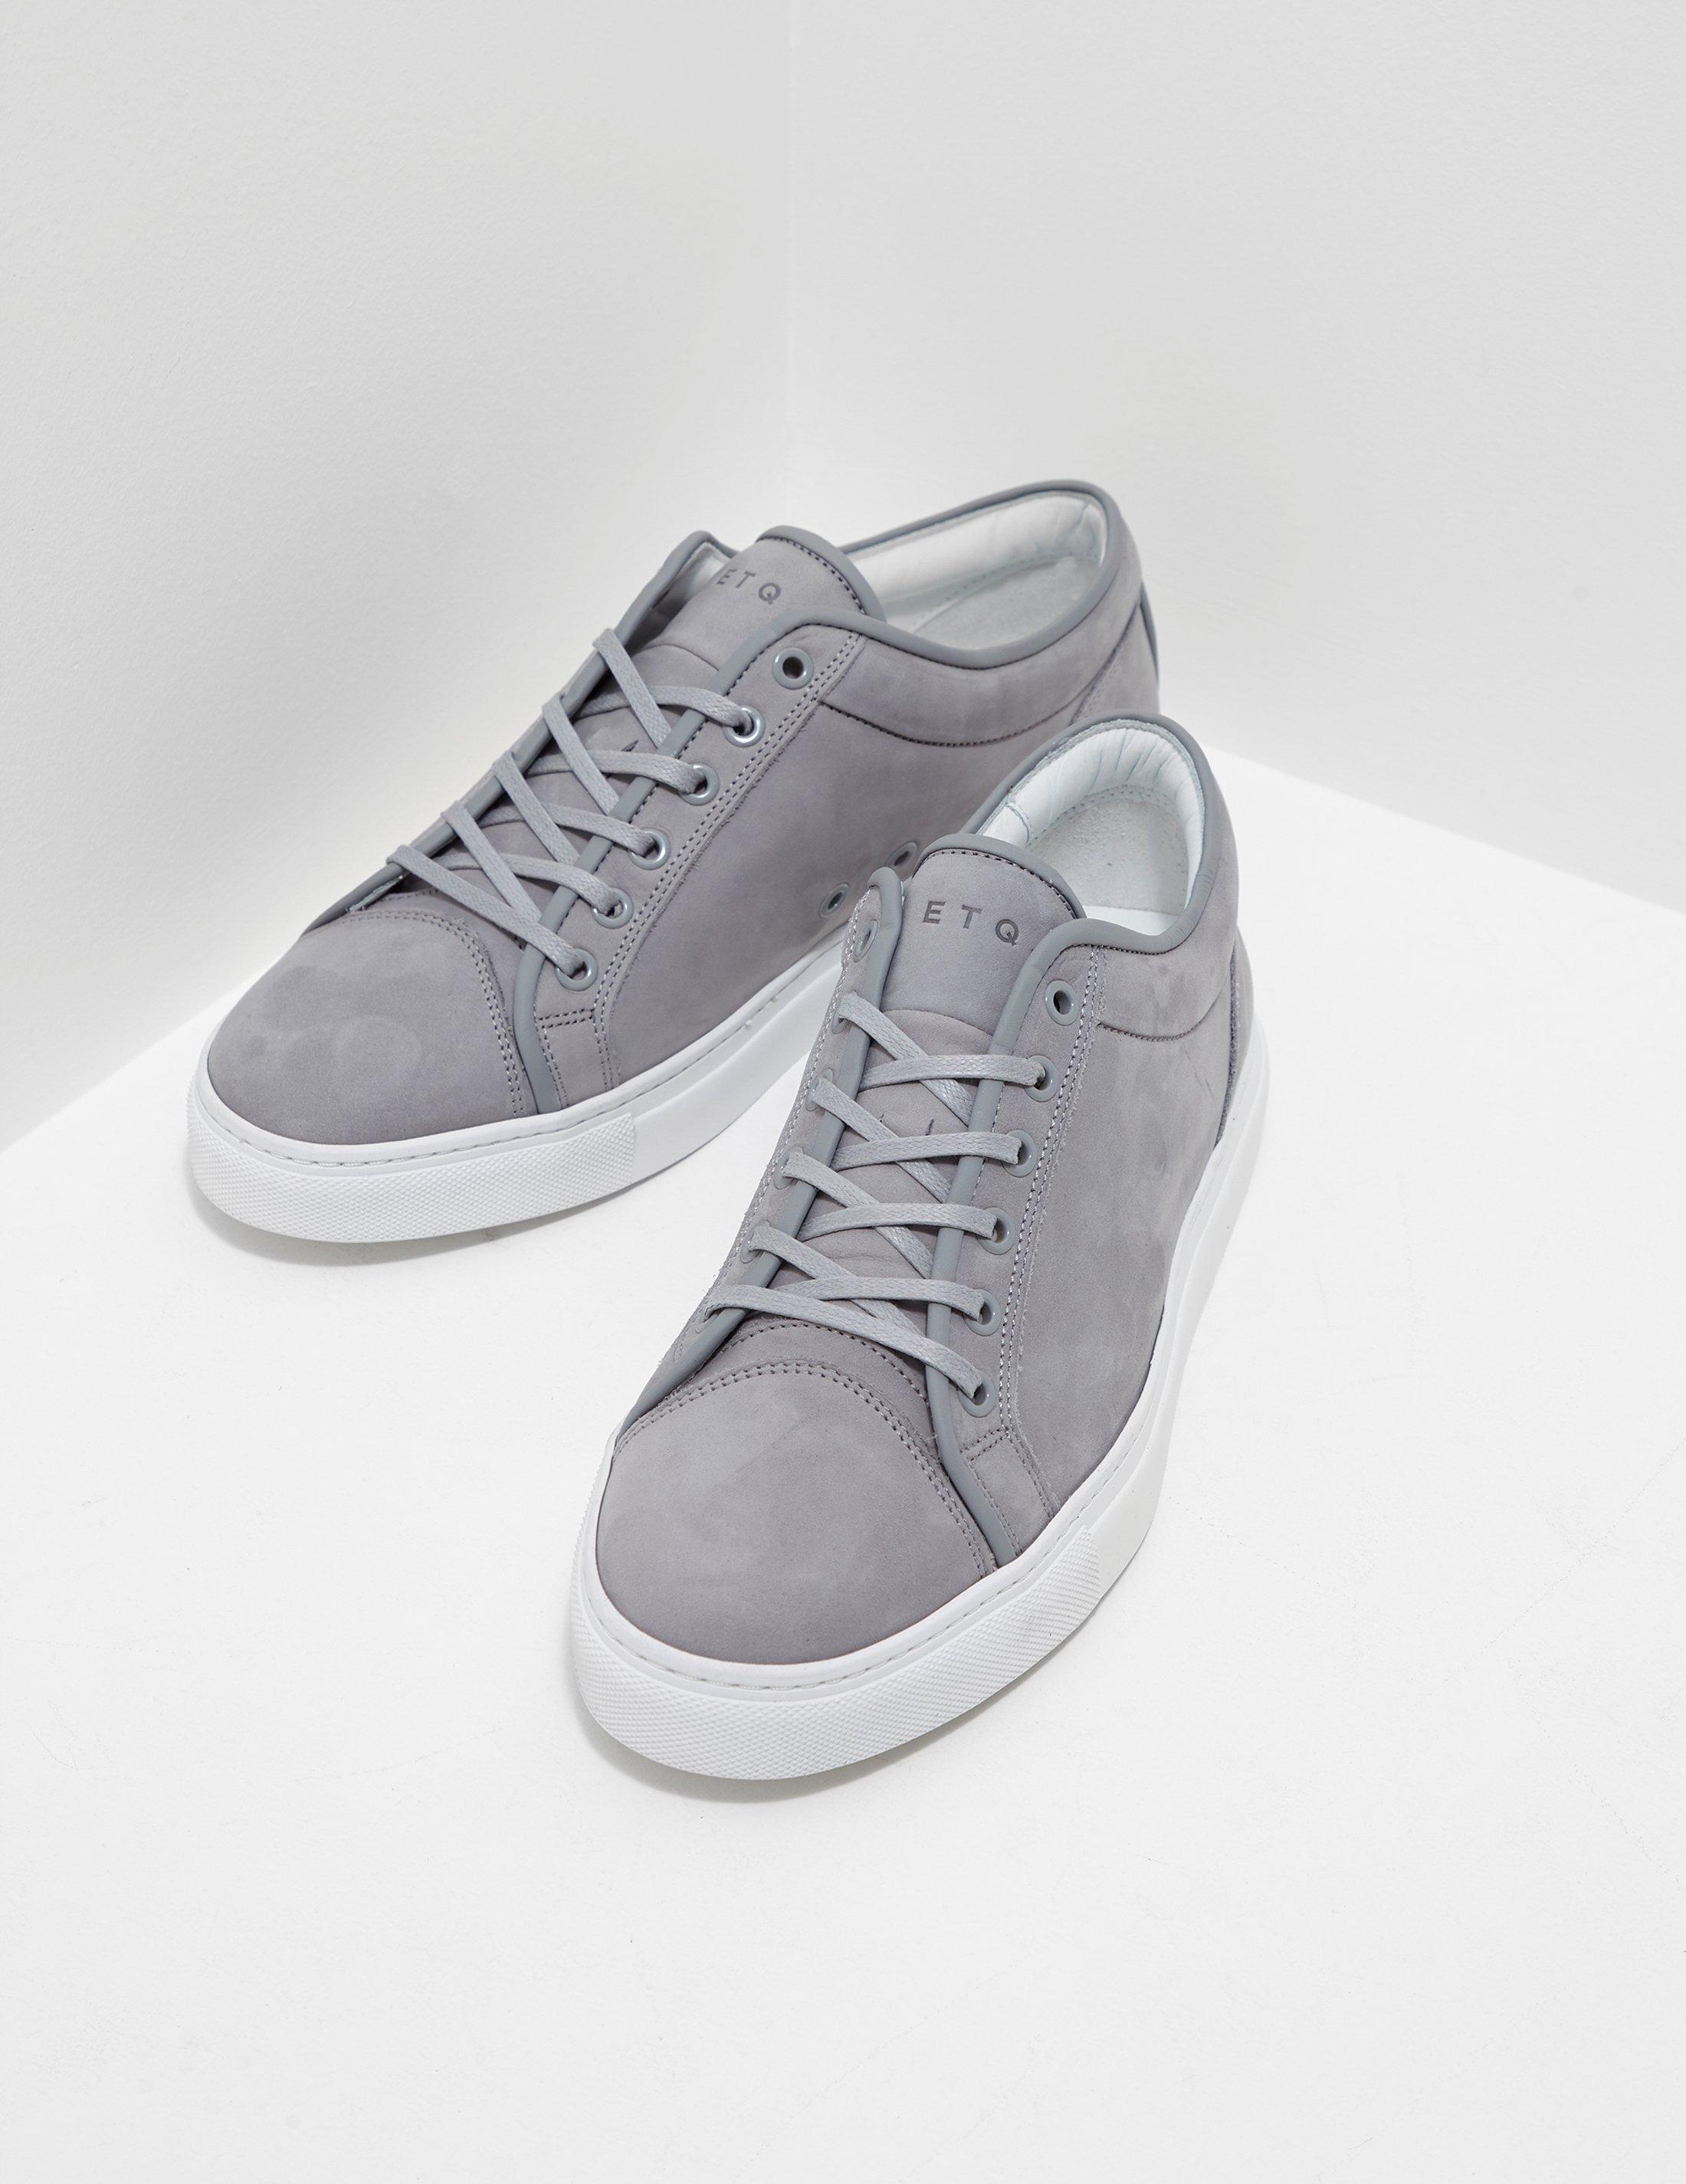 41fc5cb34b4 ETQ Amsterdam Low 1 Grey in Gray for Men - Lyst